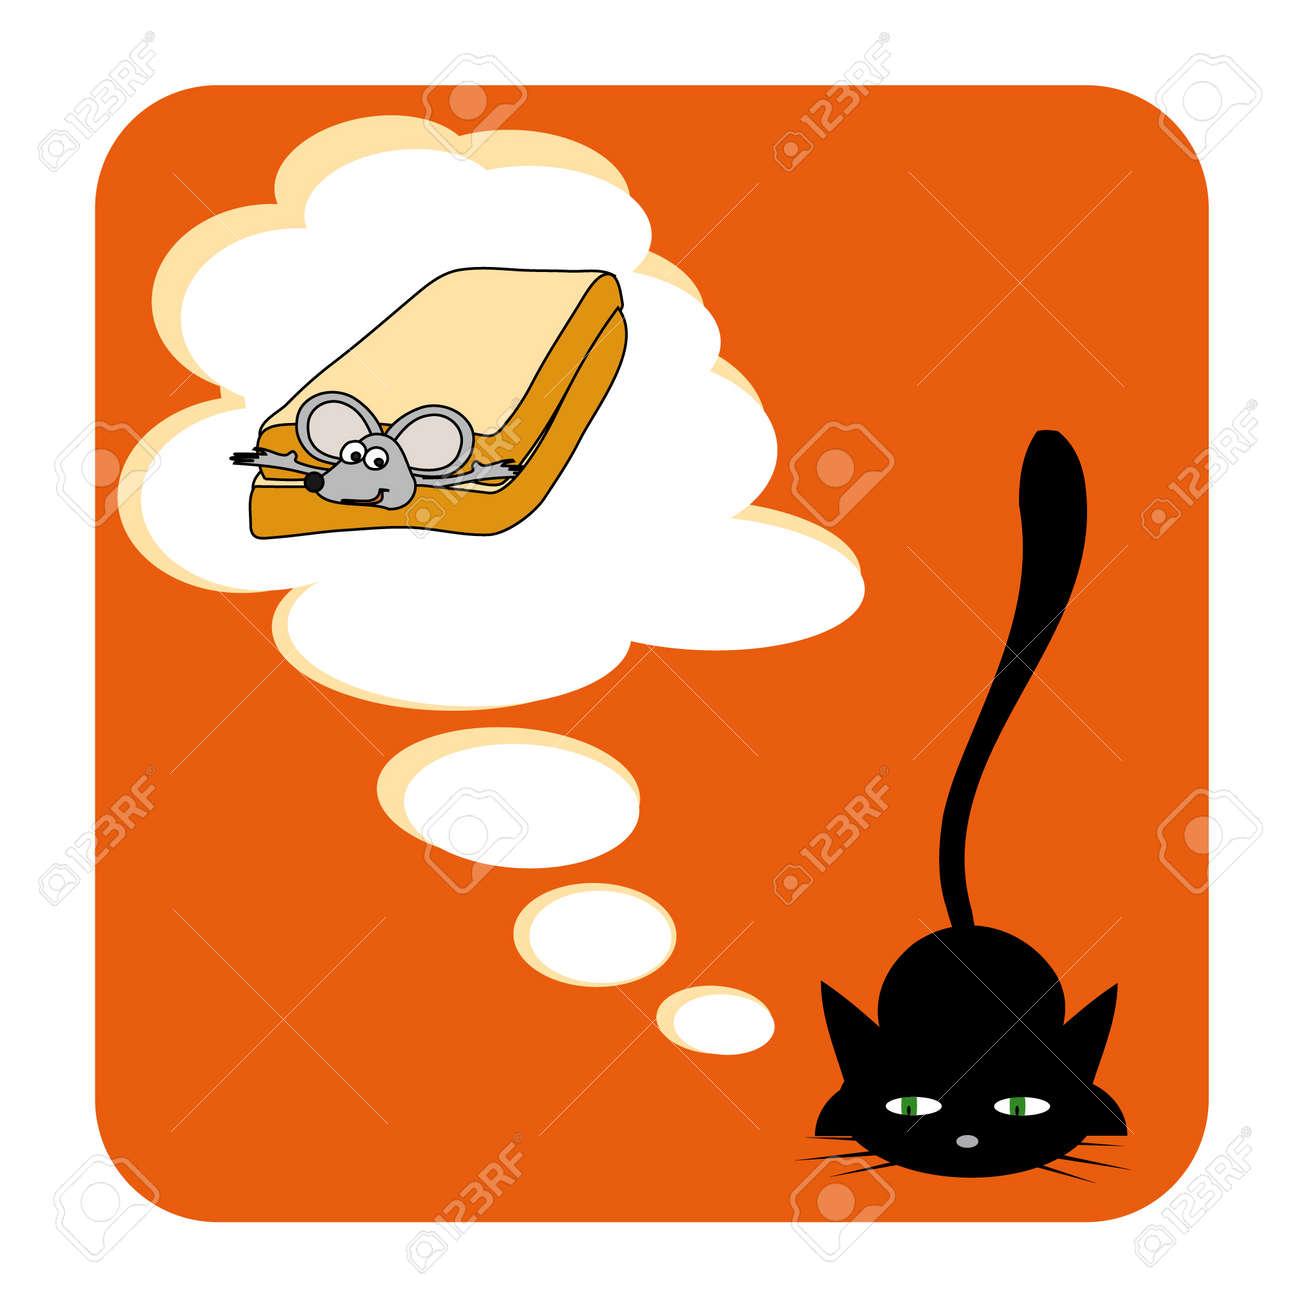 vector illustration of cat's dream Stock Vector - 3409837